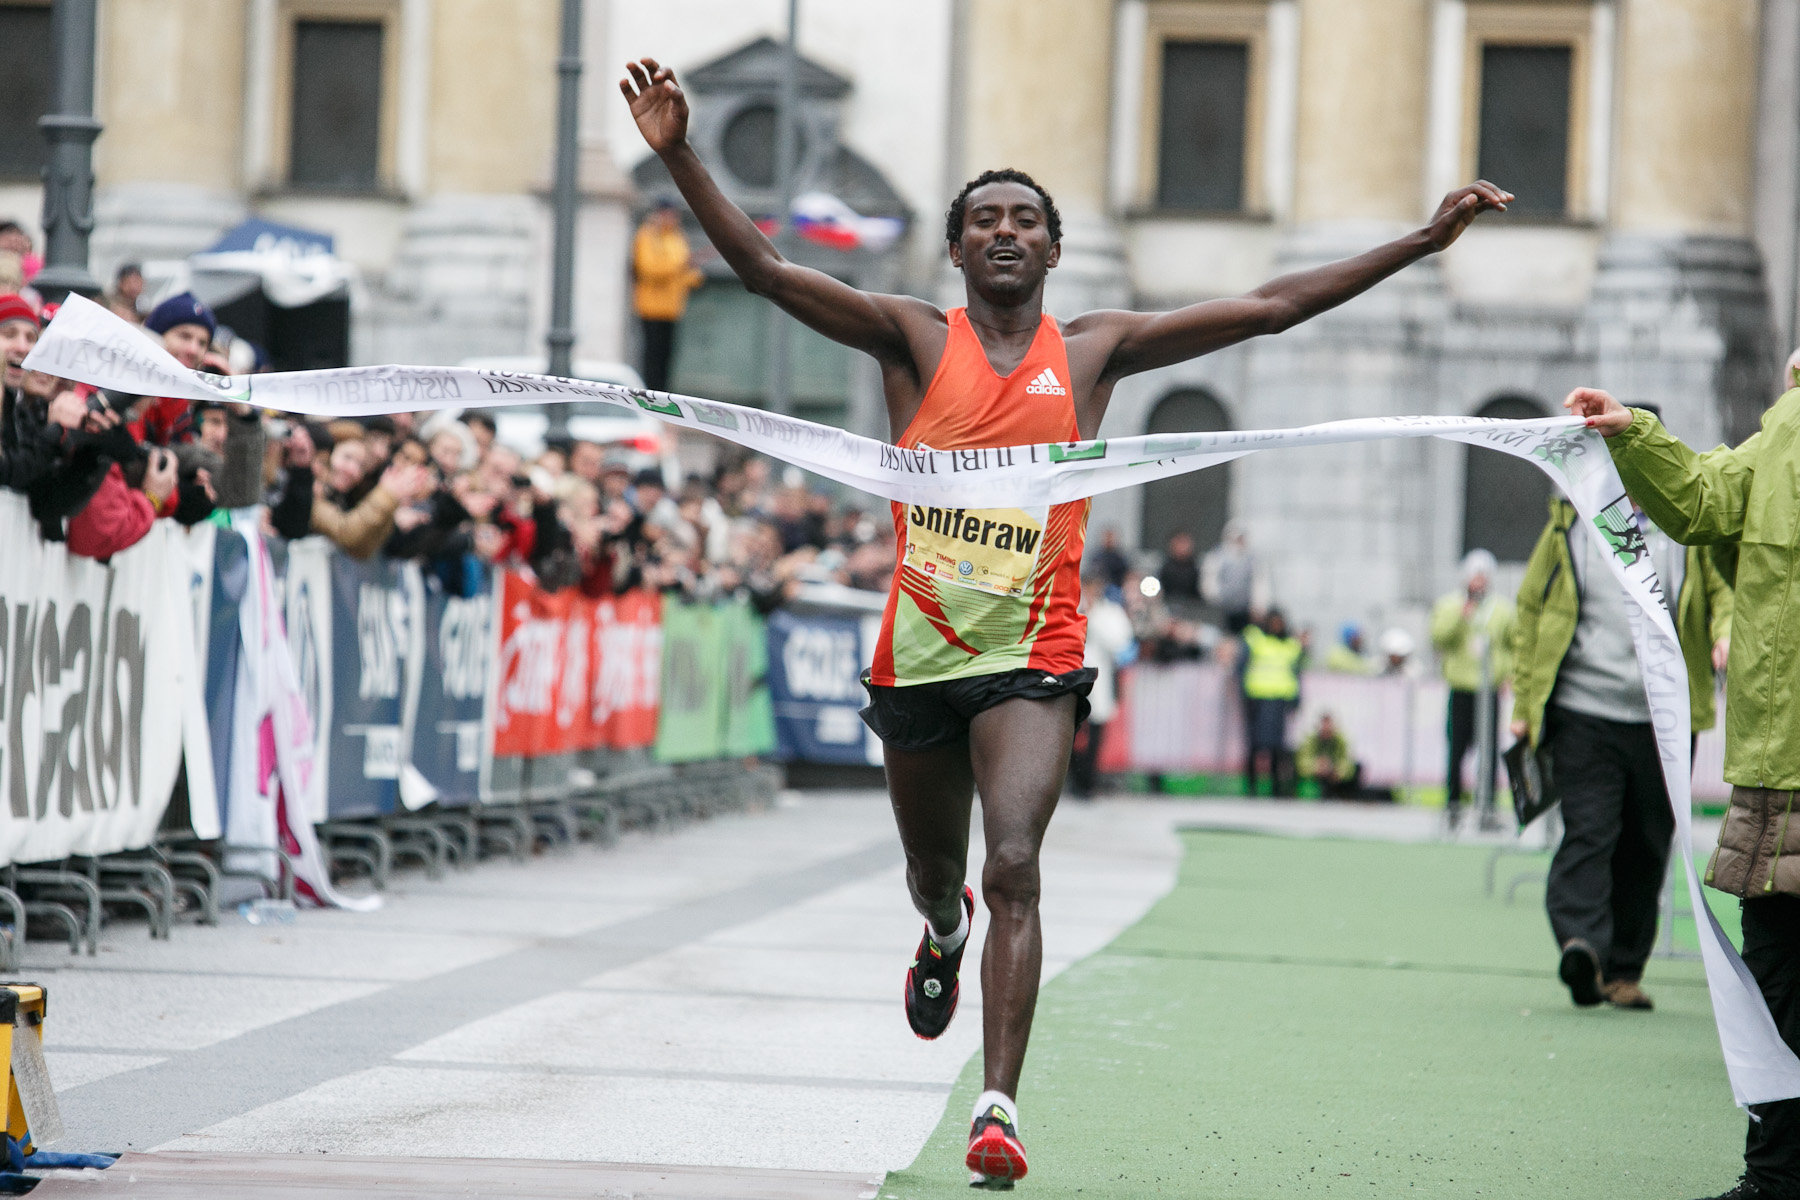 Berhanu Shiferaw of Ethiopia crosses the finish line during the 17th International Ljubljana Marathon on Oct 28, 2012 in Ljubljana, Slovenia.